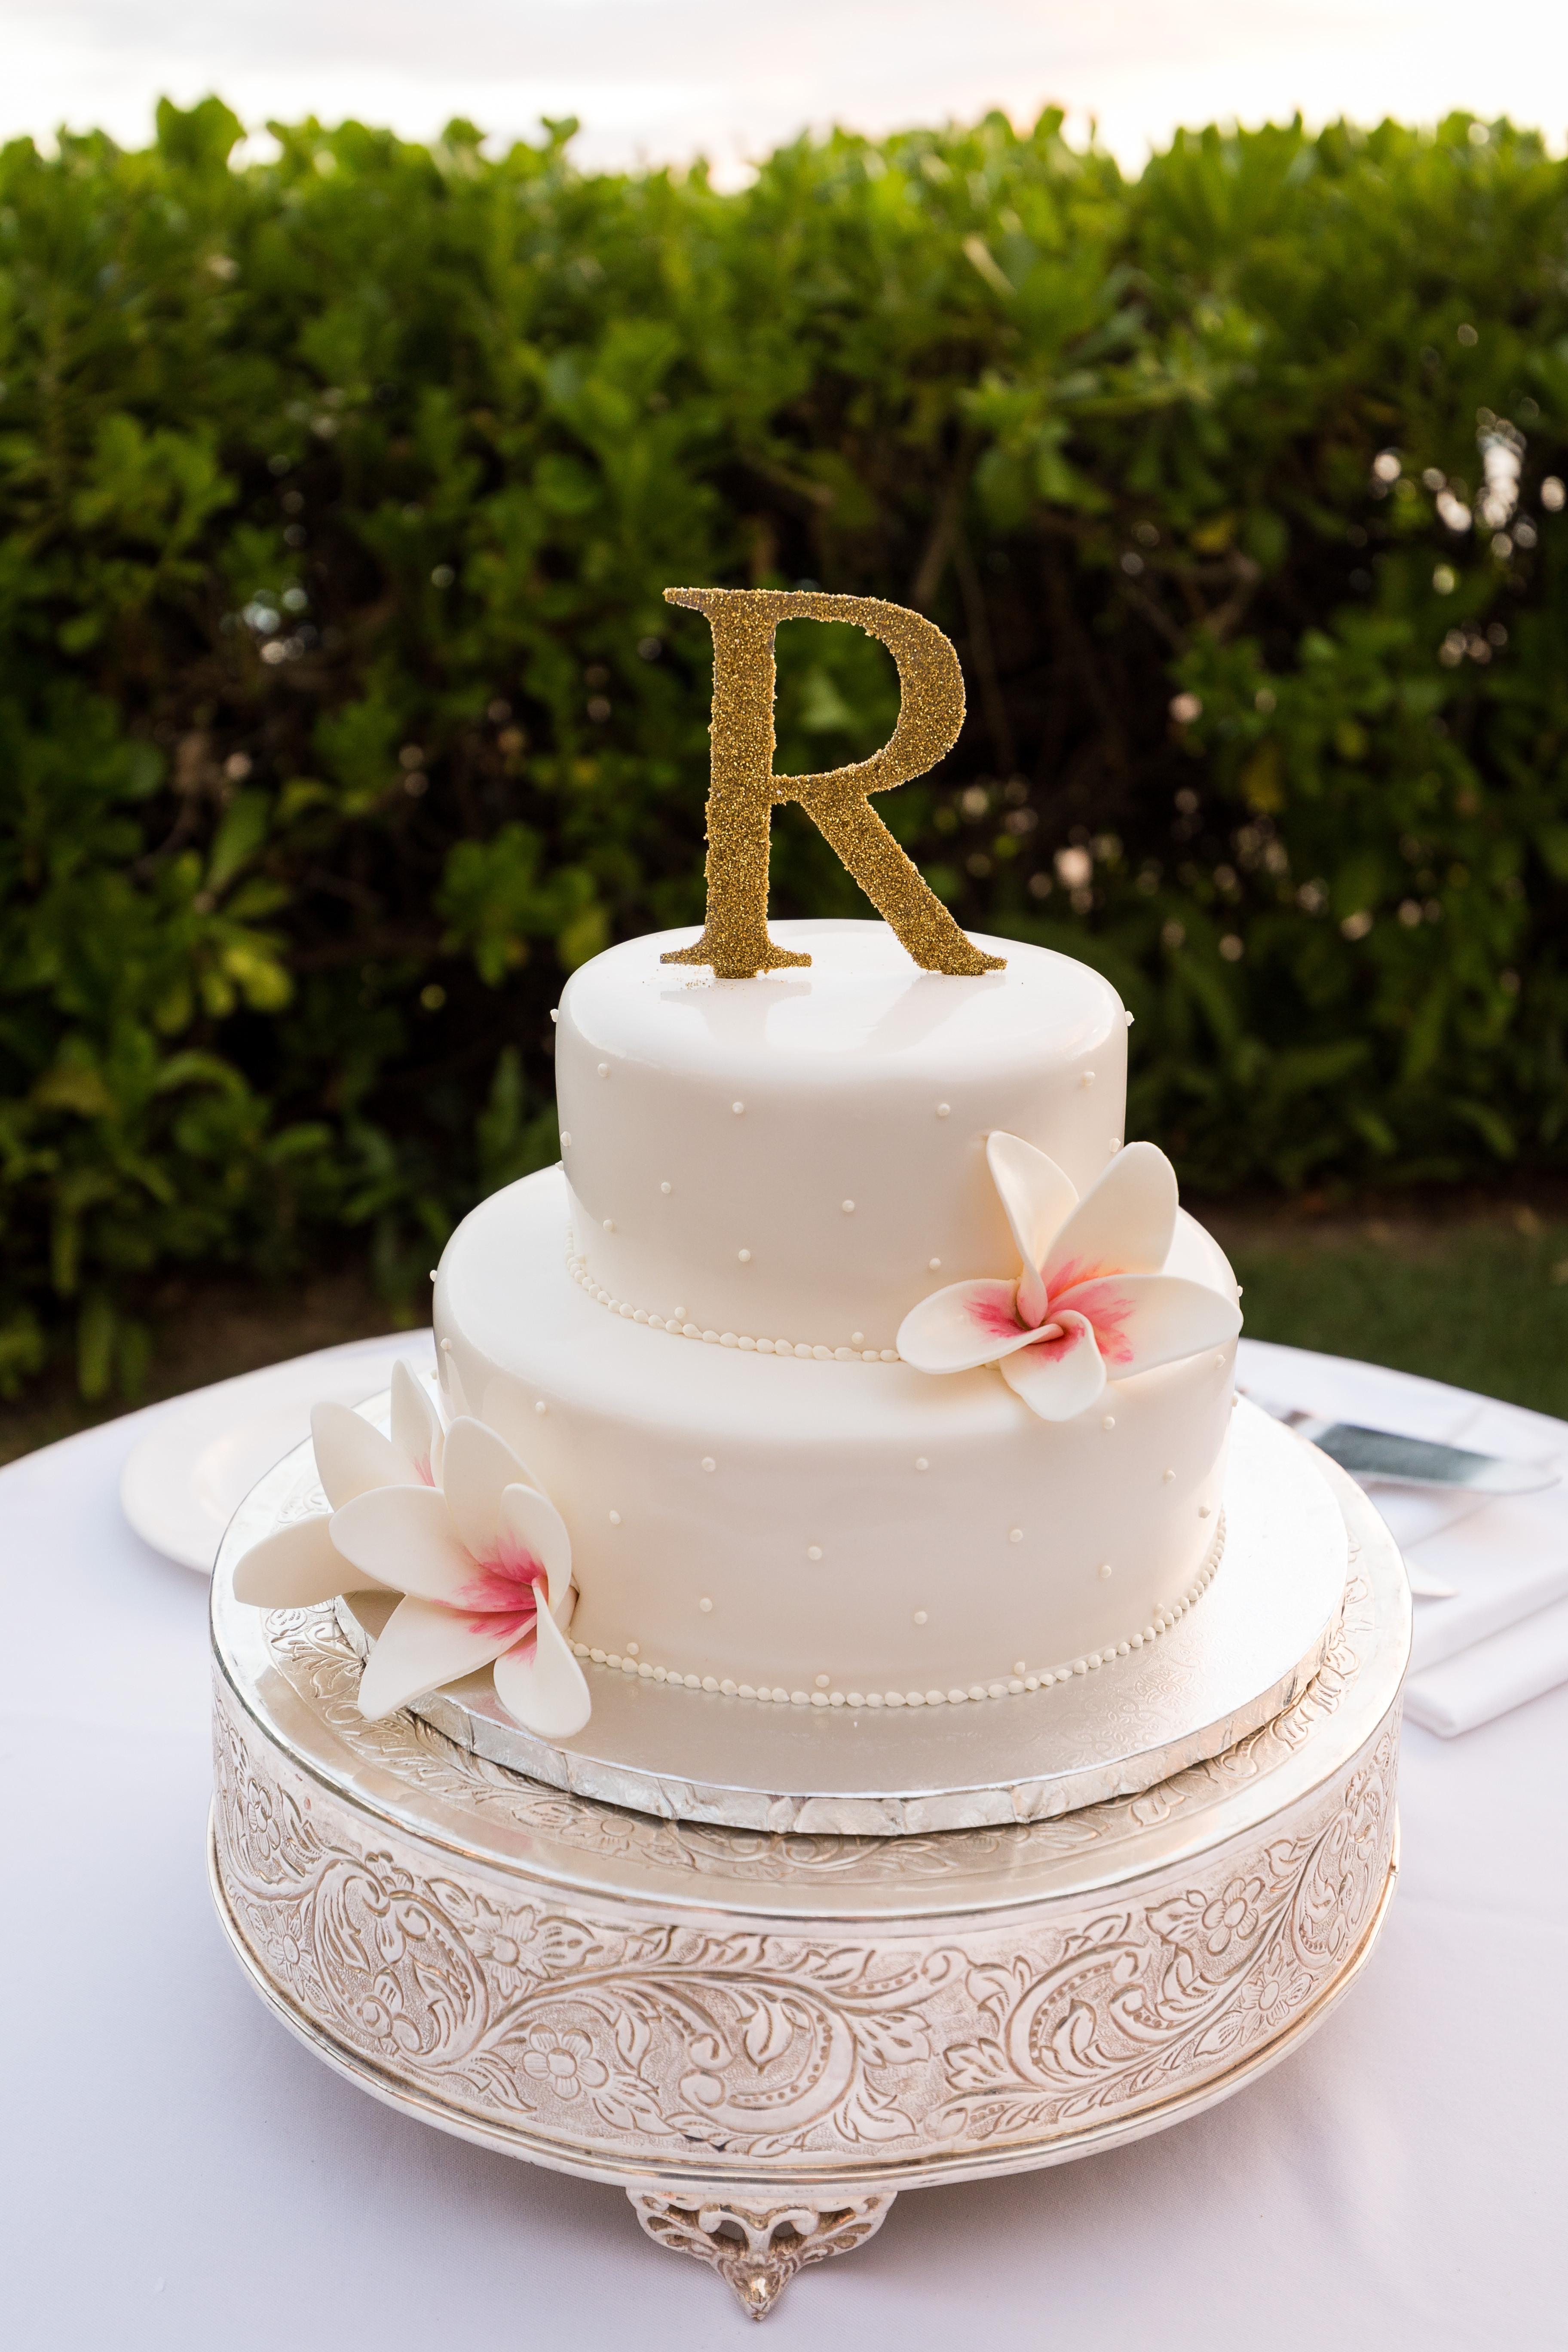 Small 2 Tier Wedding Cakes  2 Tier Wedding Cake Stand